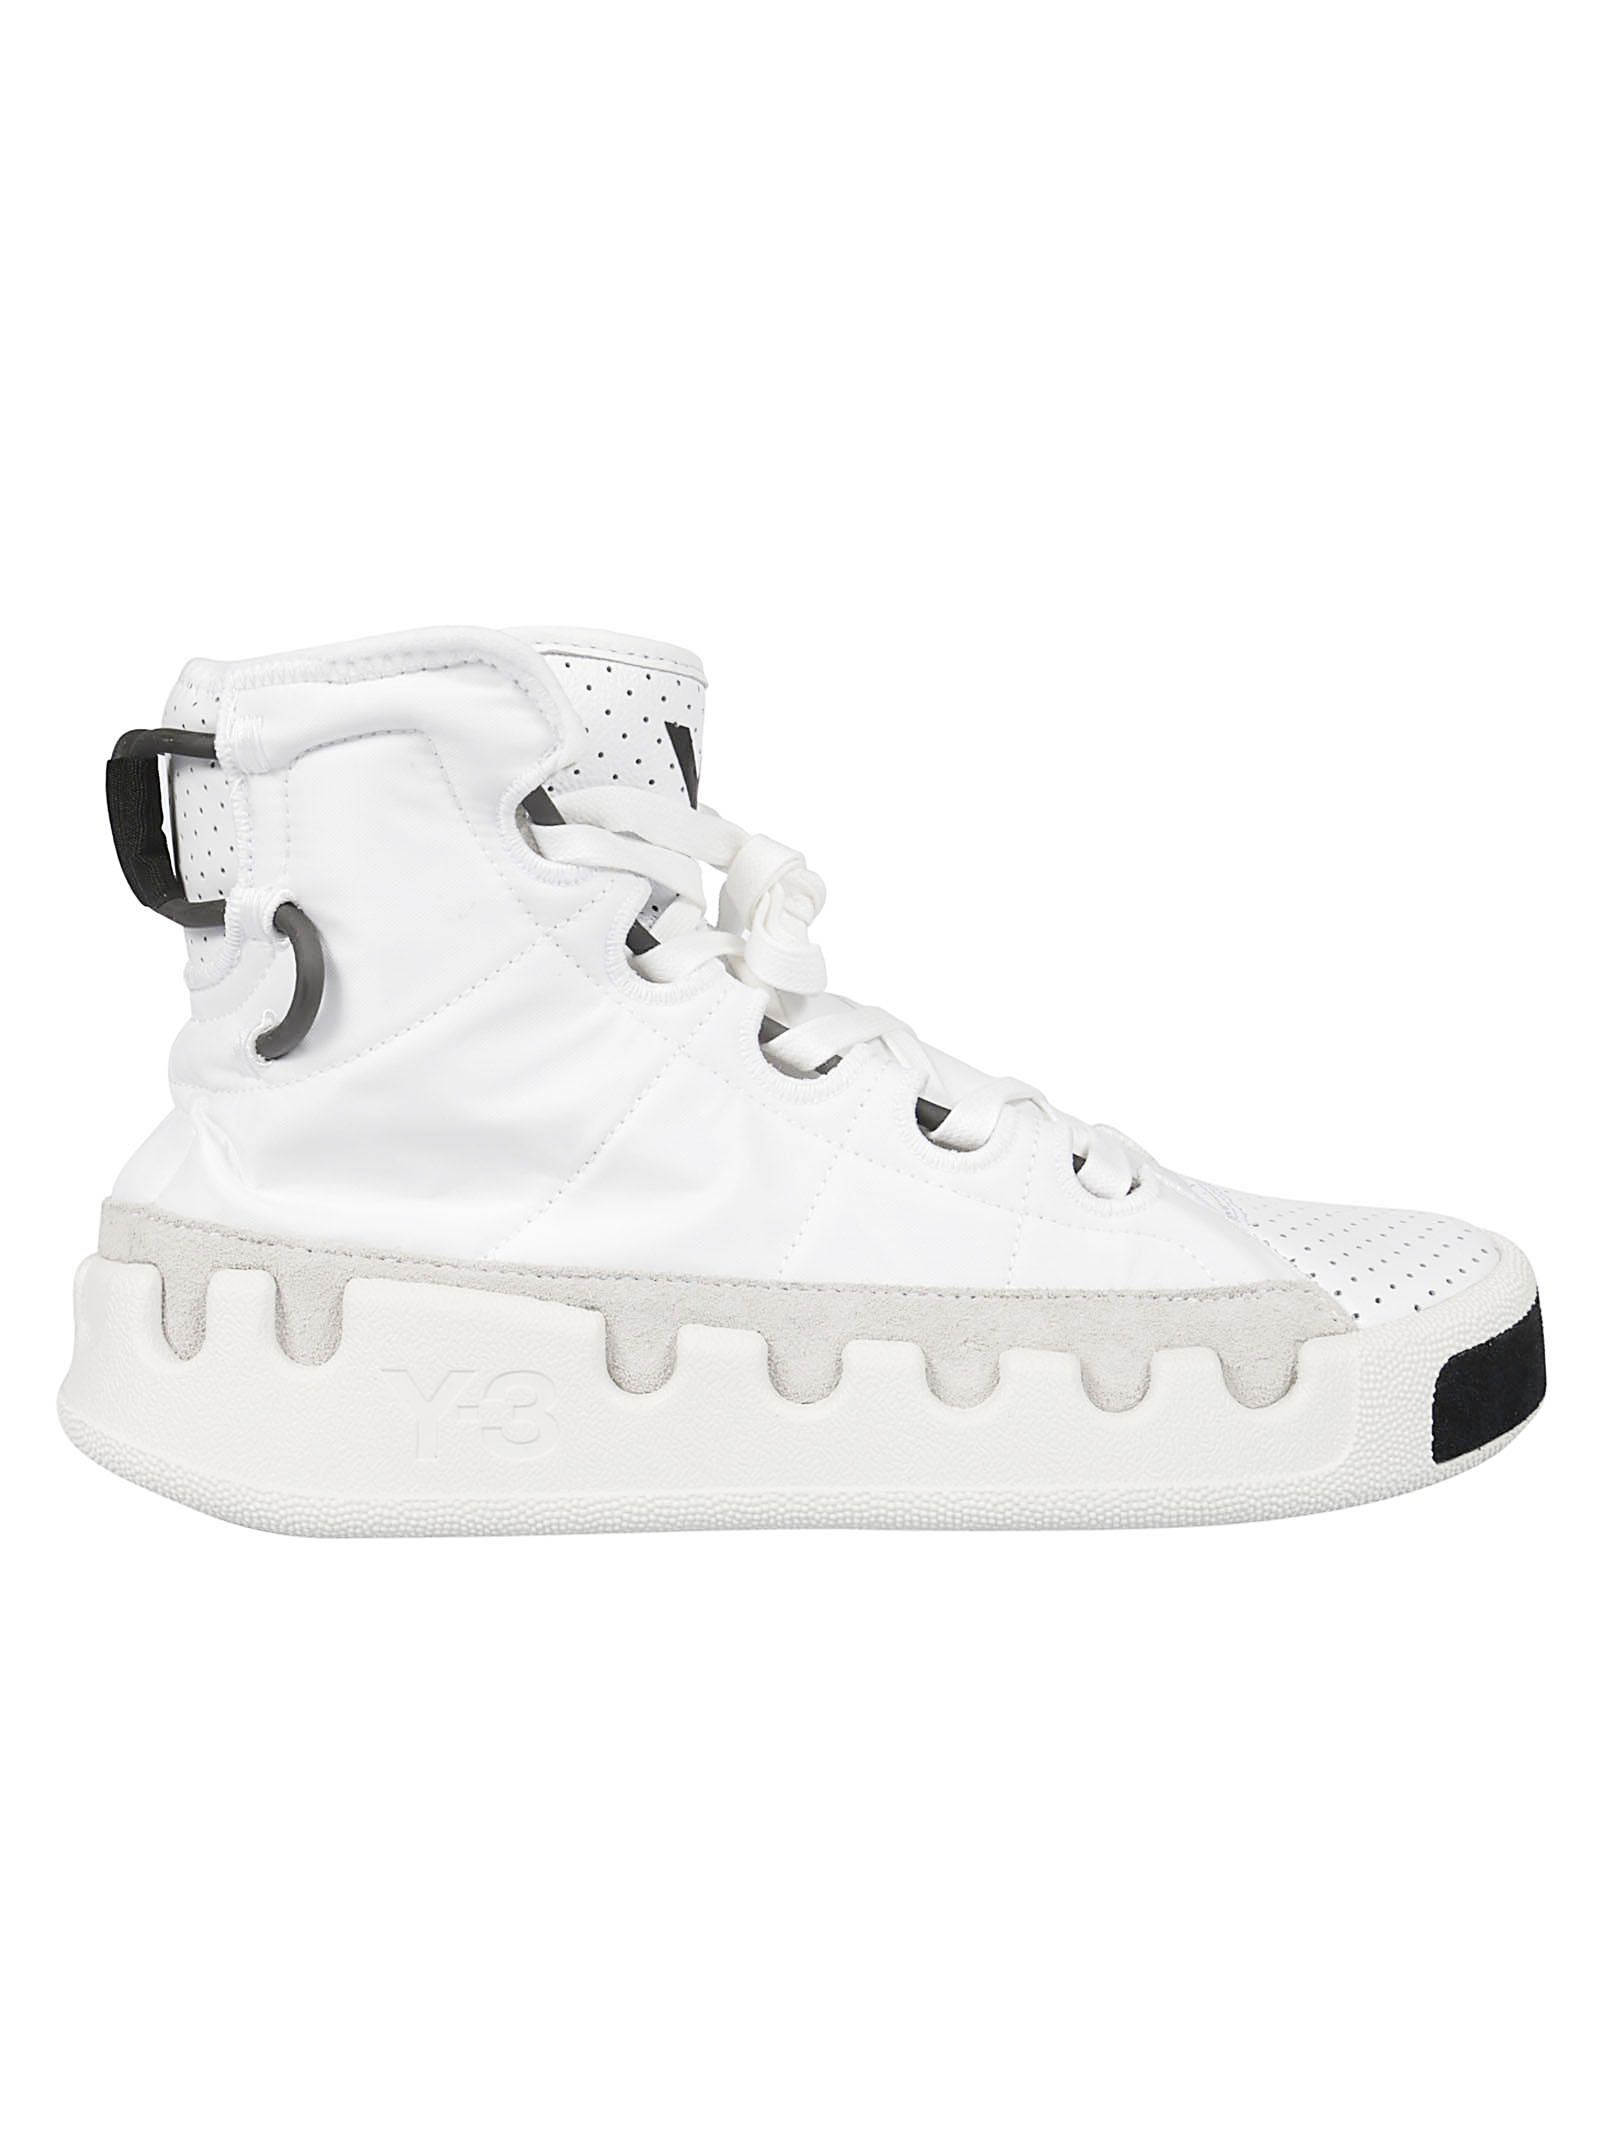 b9d29c3cfbe5f Y-3 Kasabaru Hi-top Sneakers - Ftwr White Ftwr White .